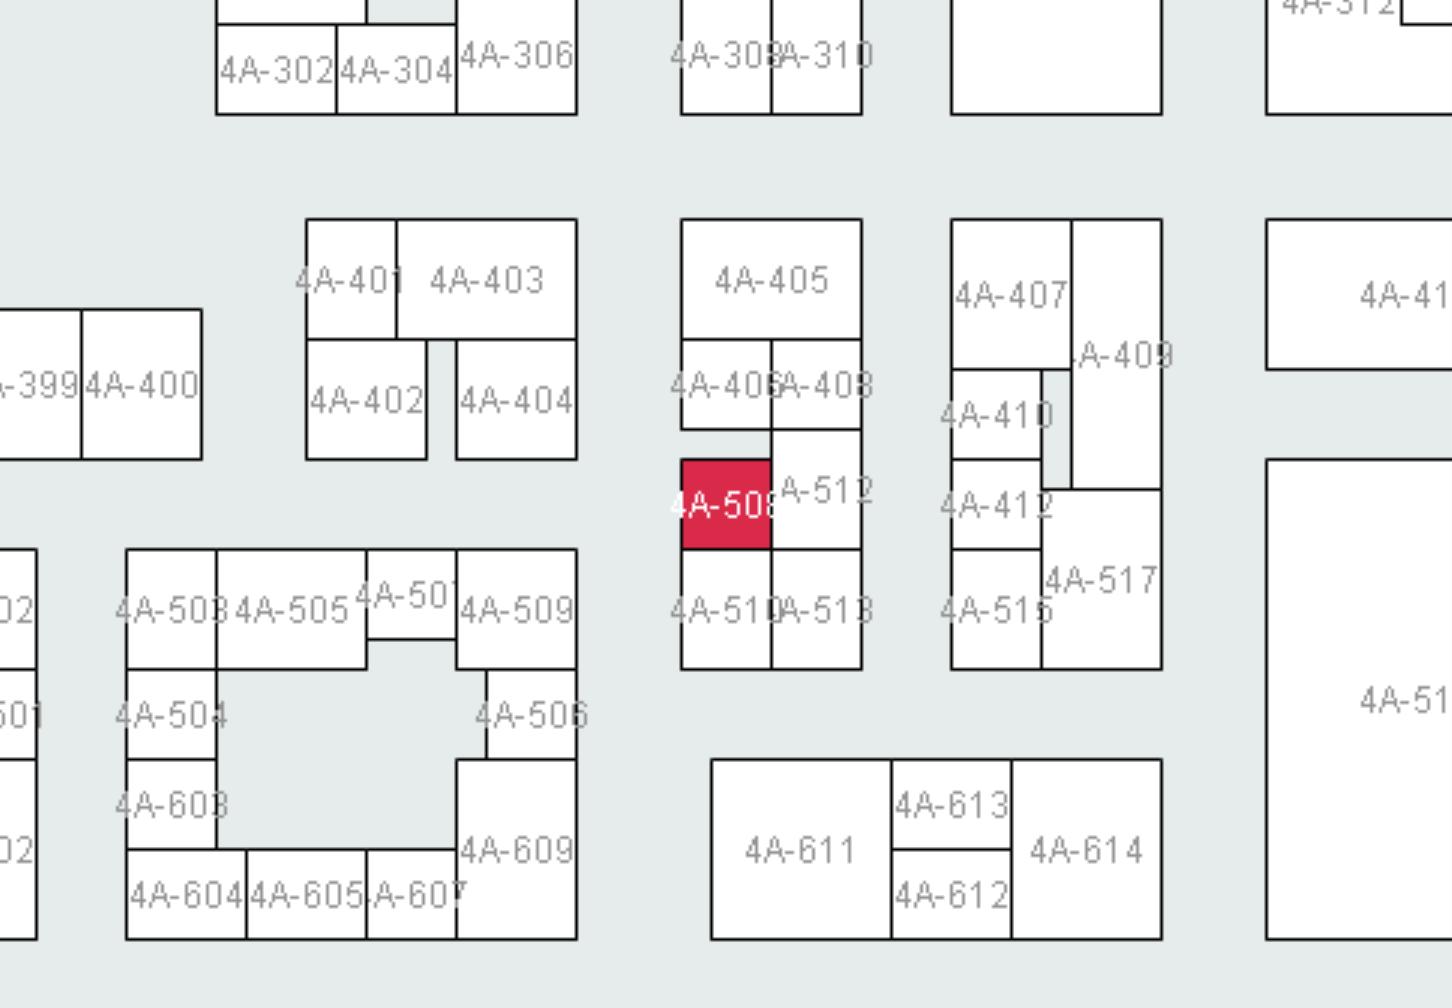 4A / 4A-508